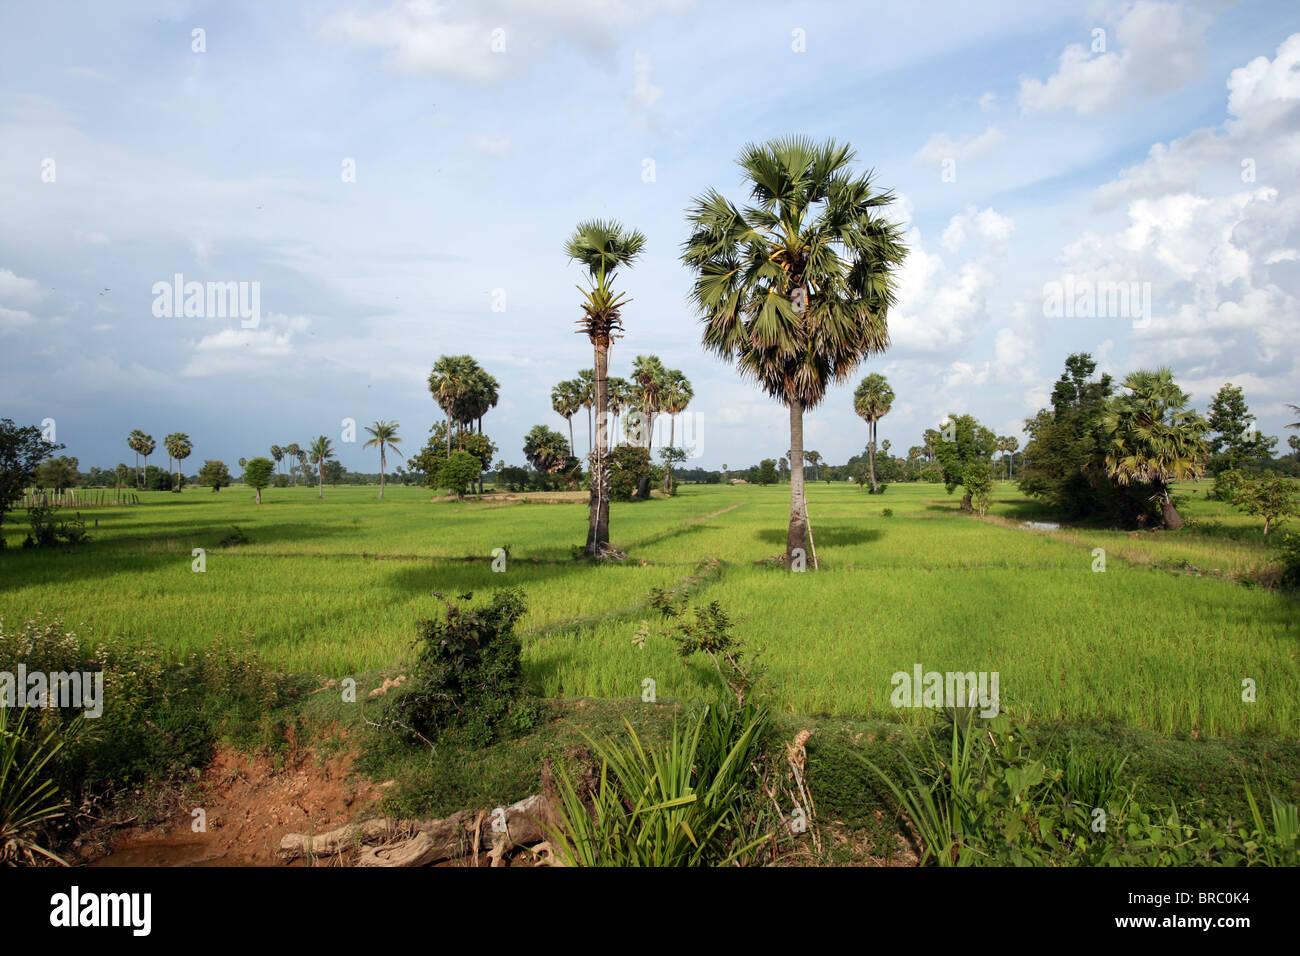 Cambodian countrside near Siem Reap, Cambodia Stock Photo